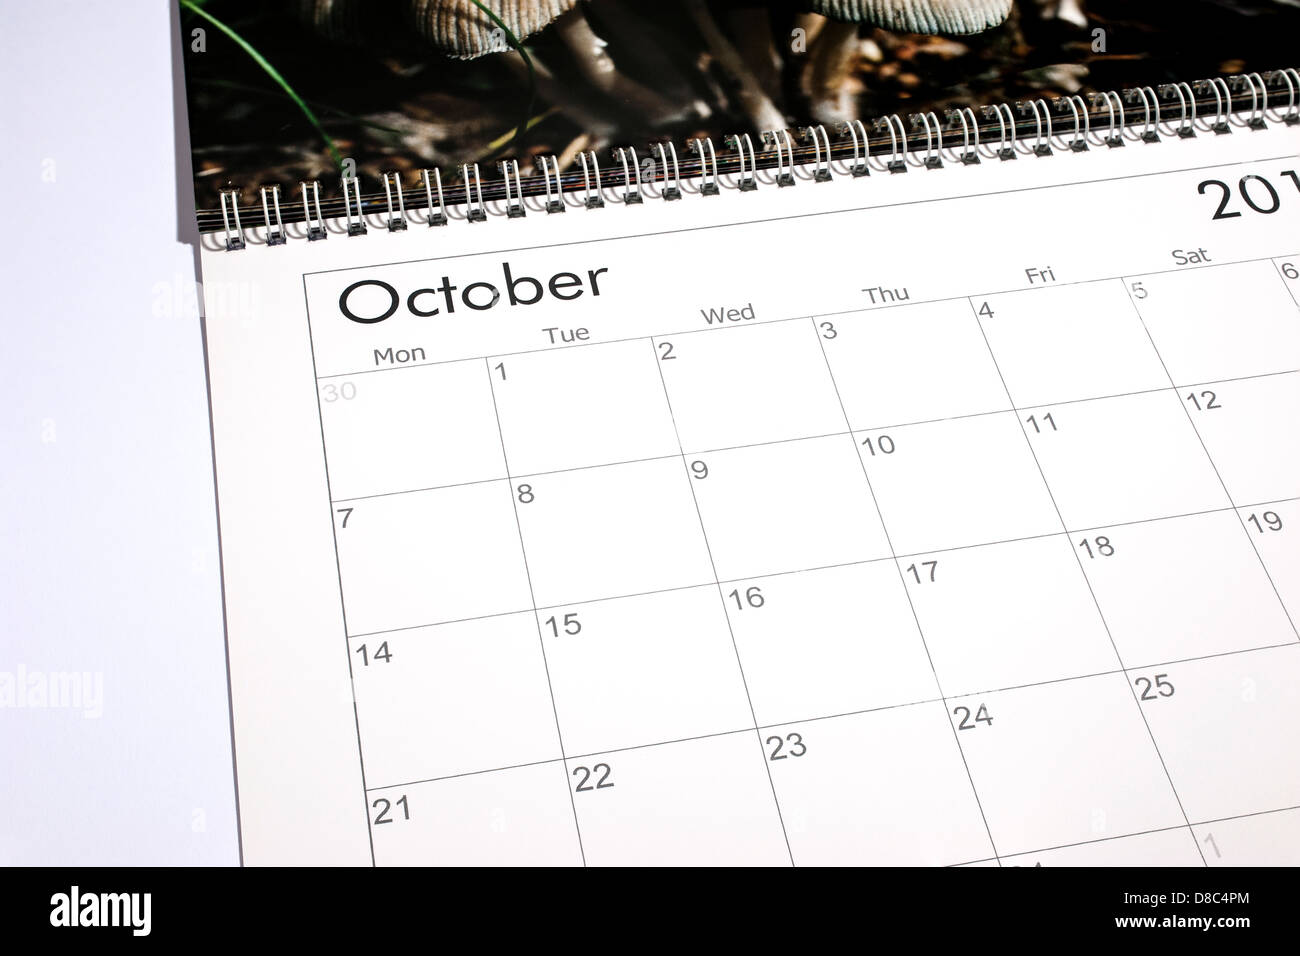 Calendrier vide page - Octobre 2013 Photo Stock